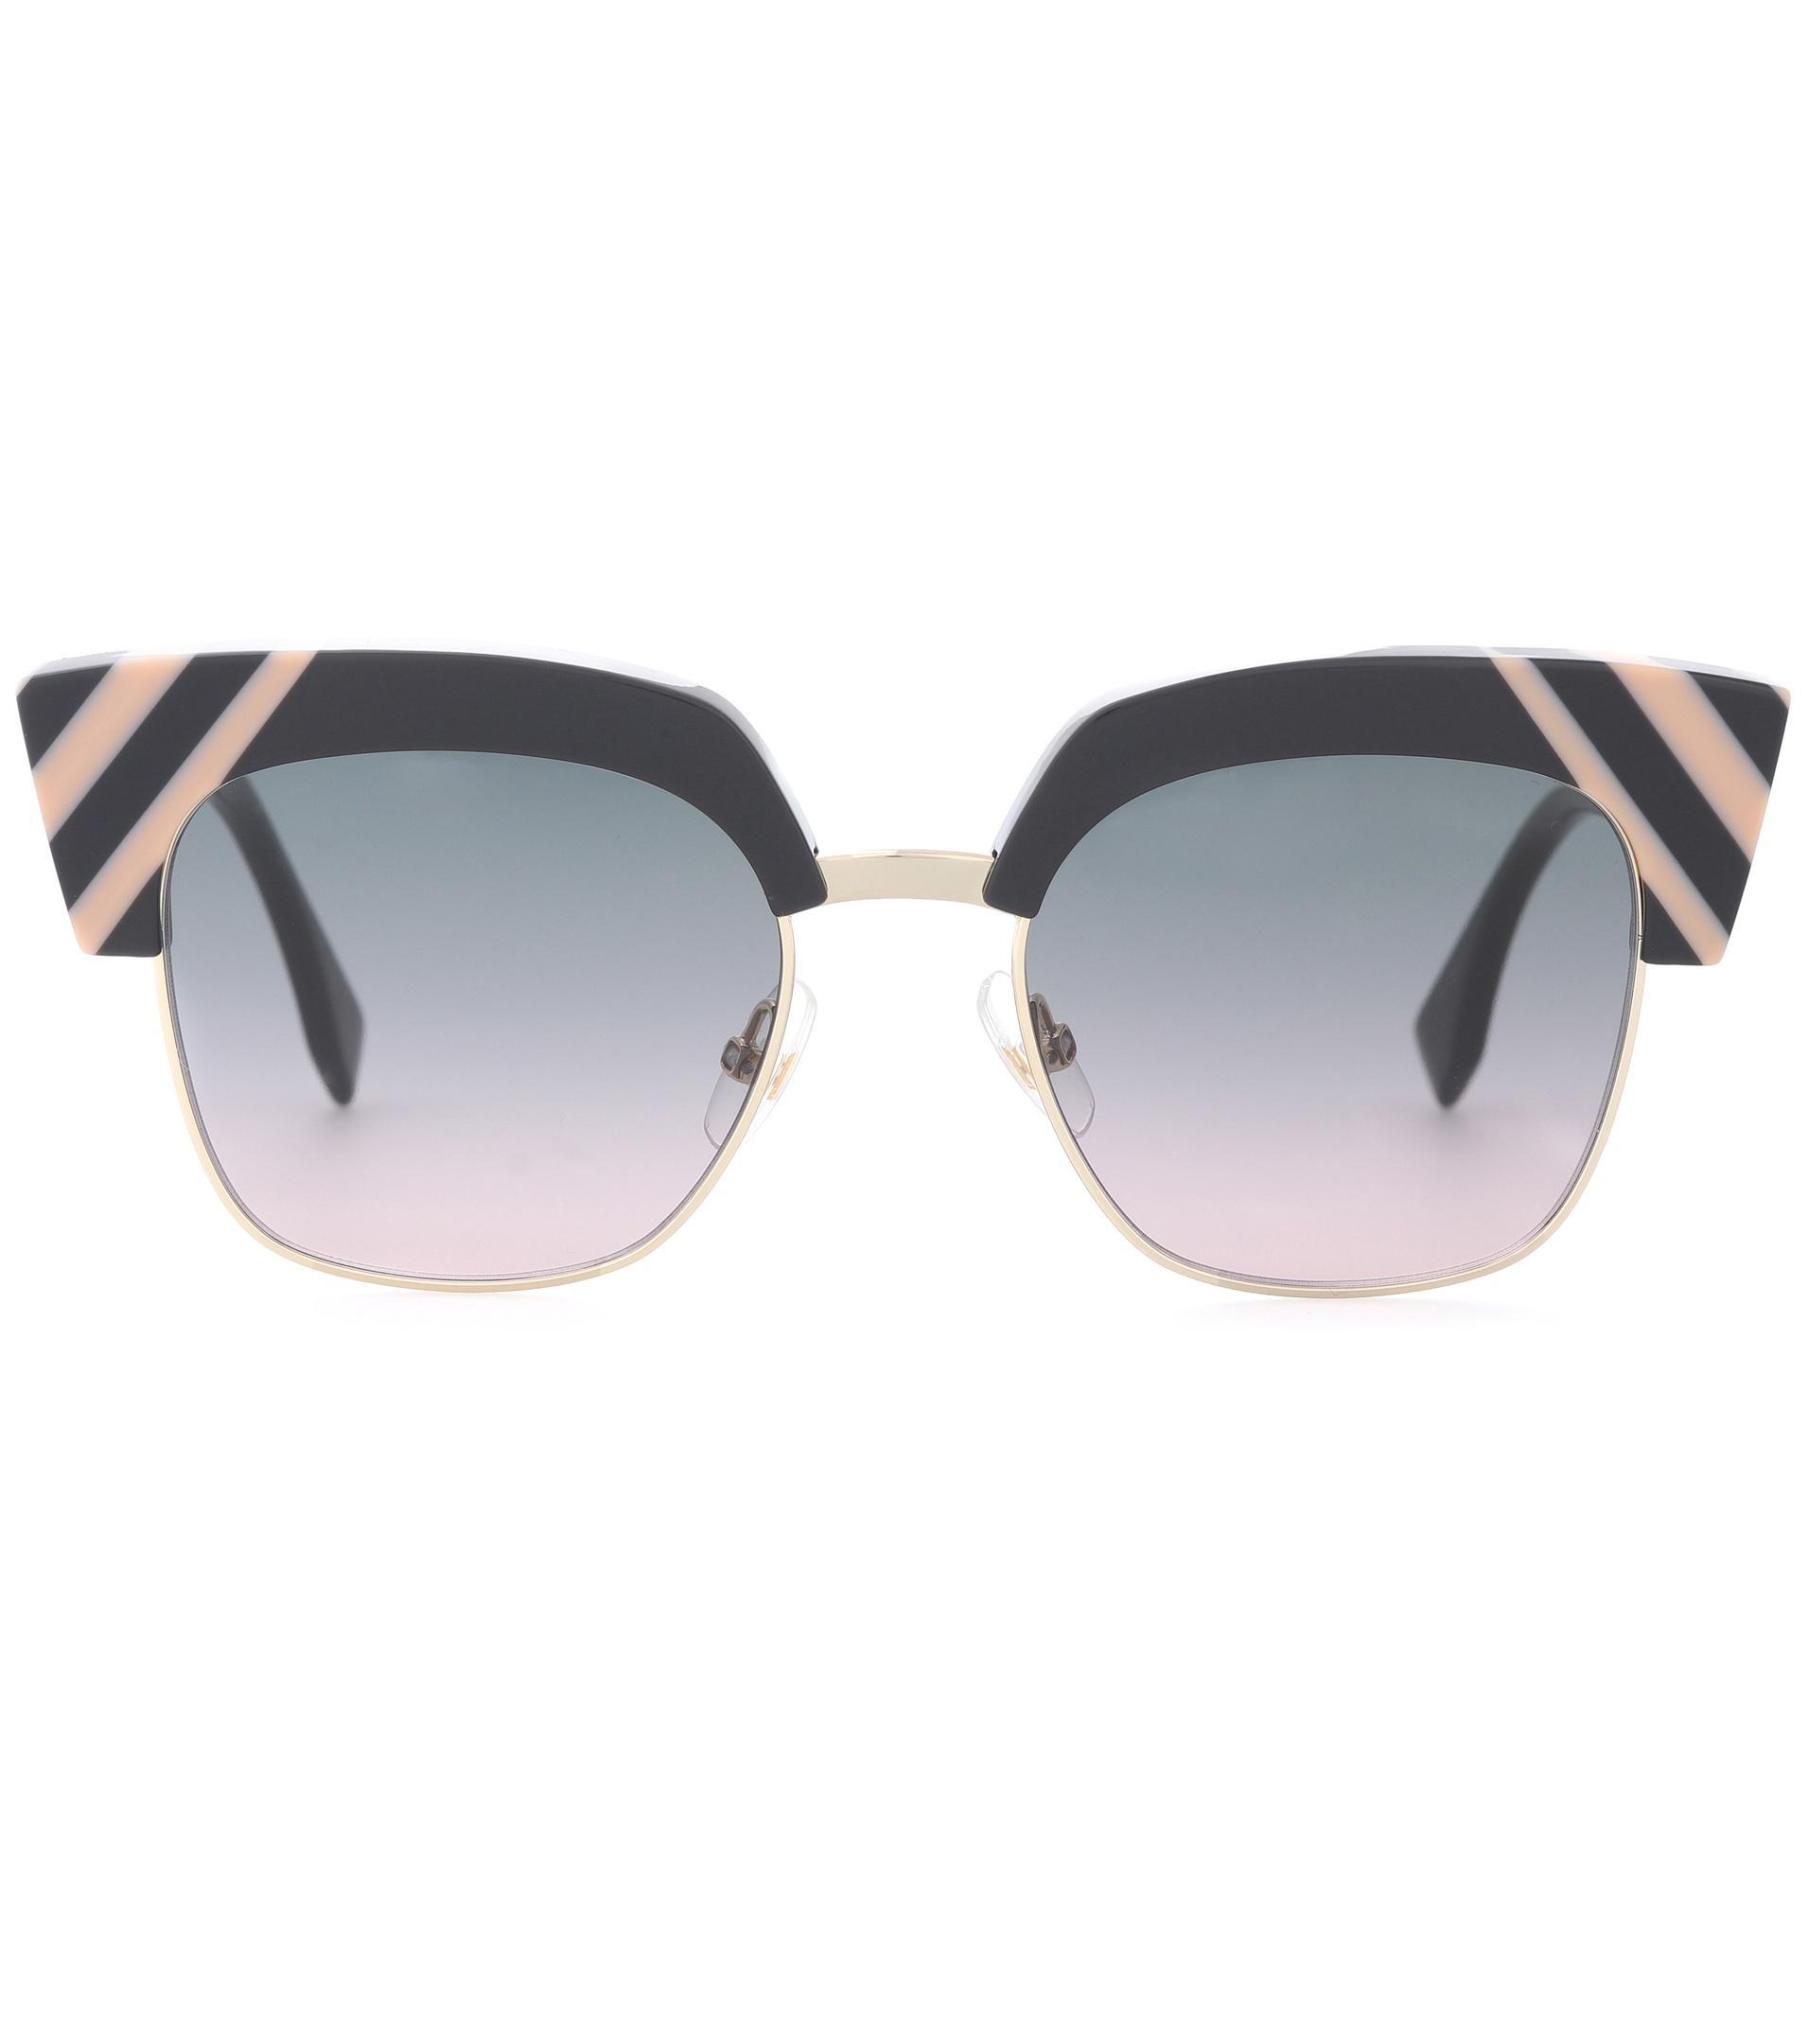 8c5517fc90 Lyst - Fendi Waves Sunglasses in Black